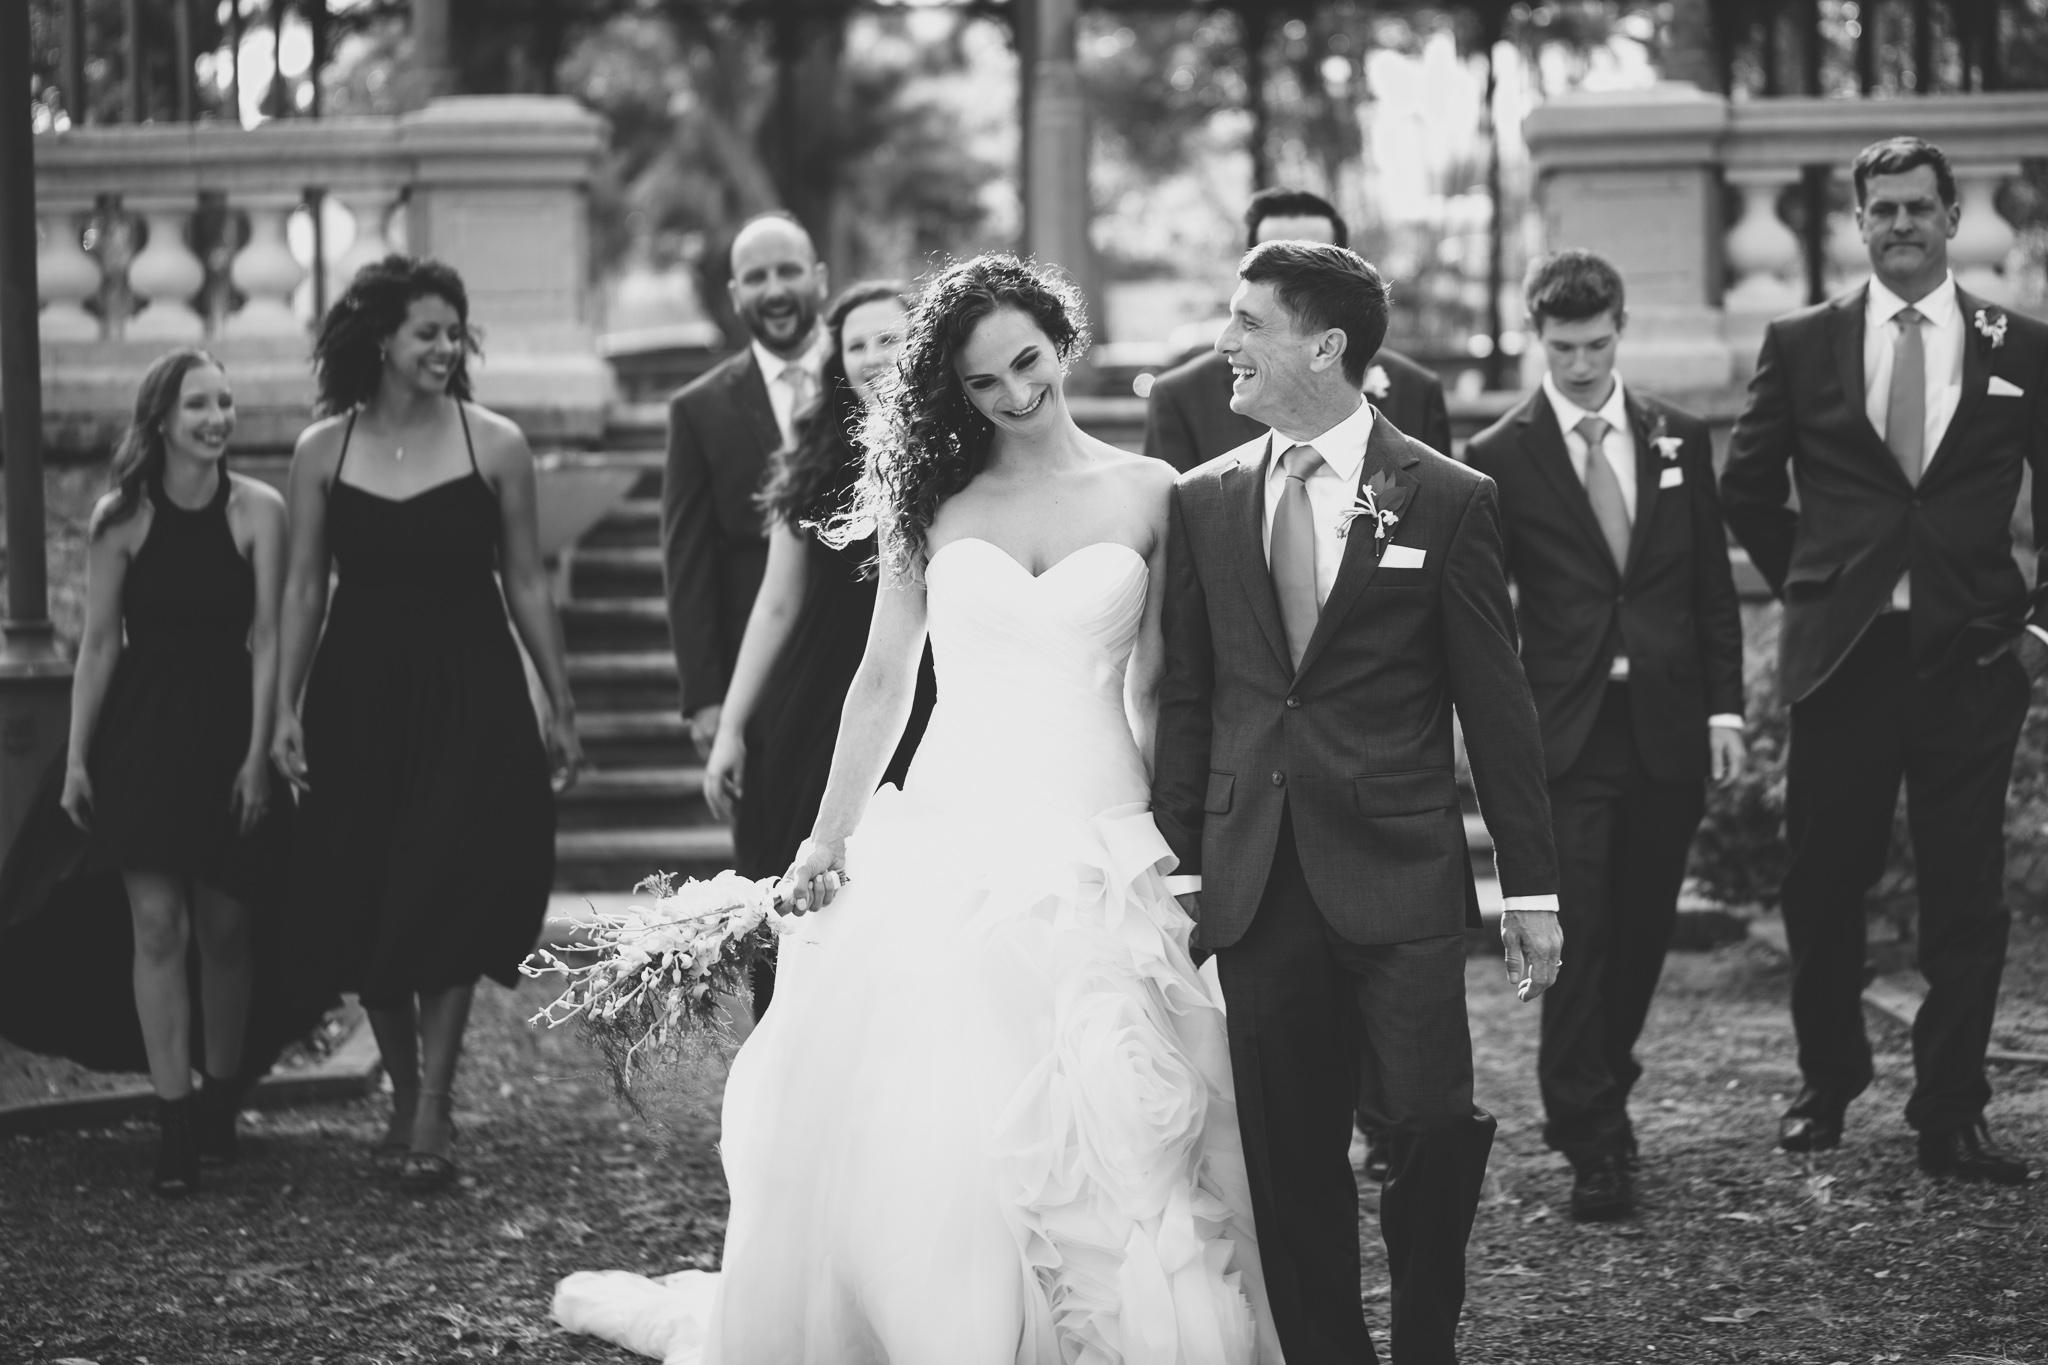 062-best-detroit-michigan-outdoor-destination-wedding-photographer.jpg